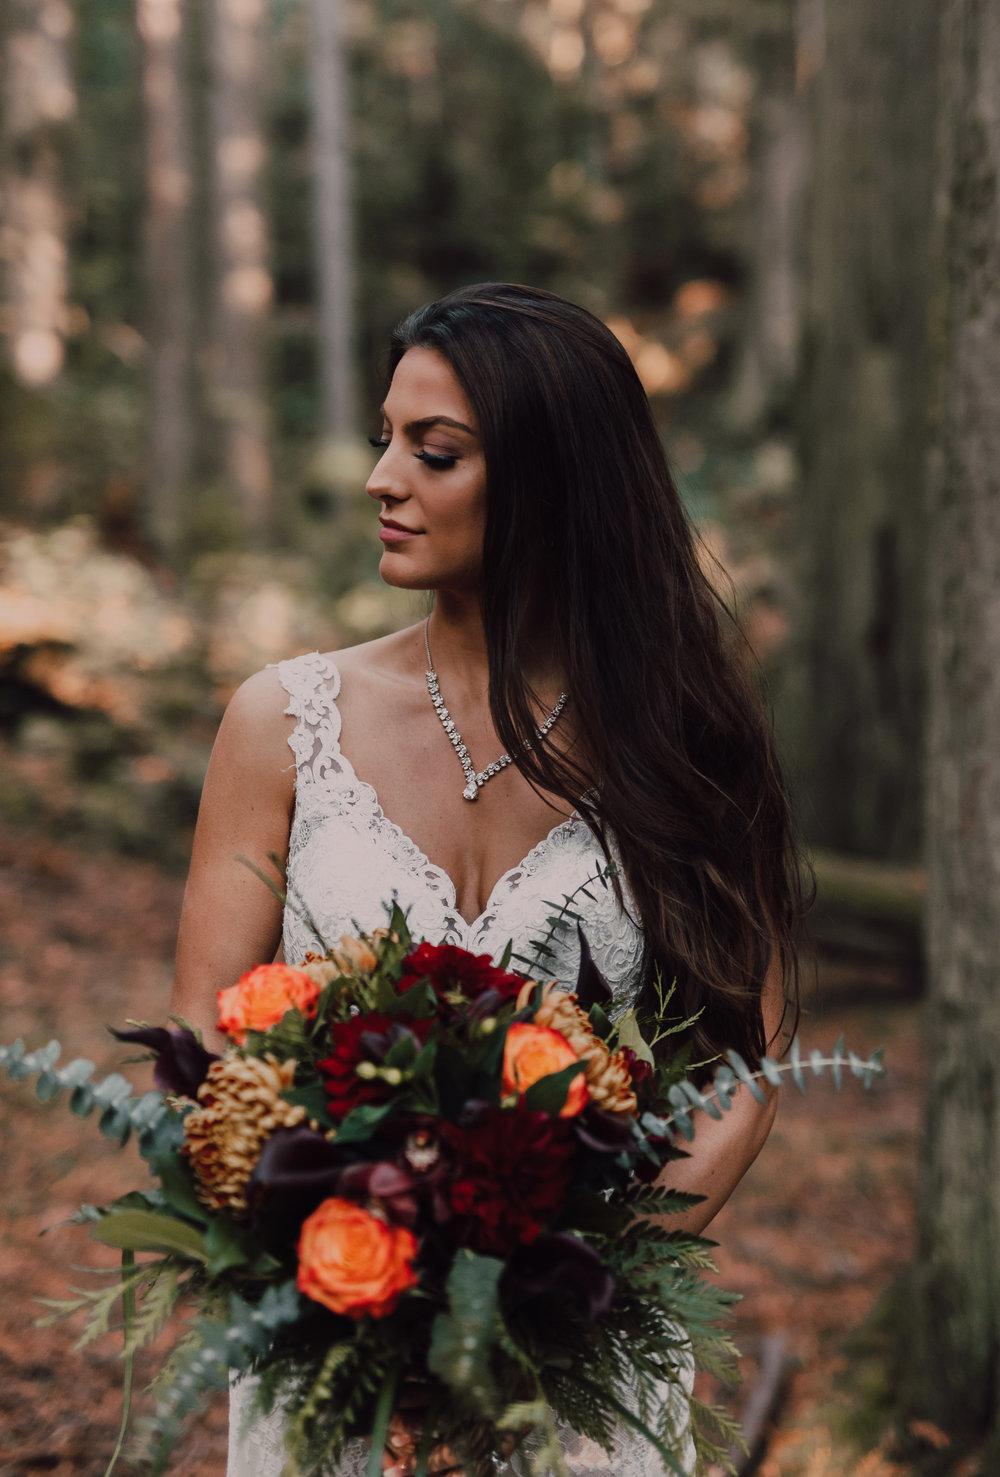 Day After Wedding Photos - Sunshine Coast Wedding Photos - Sunset Wedding Photos - Vancouver Wedding Photographer & Videographer - Sunshine Coast Wedding Photos - Sunshine Coast Wedding Photographer - Jennifer Picard Photography - 1A5A7415.jpg